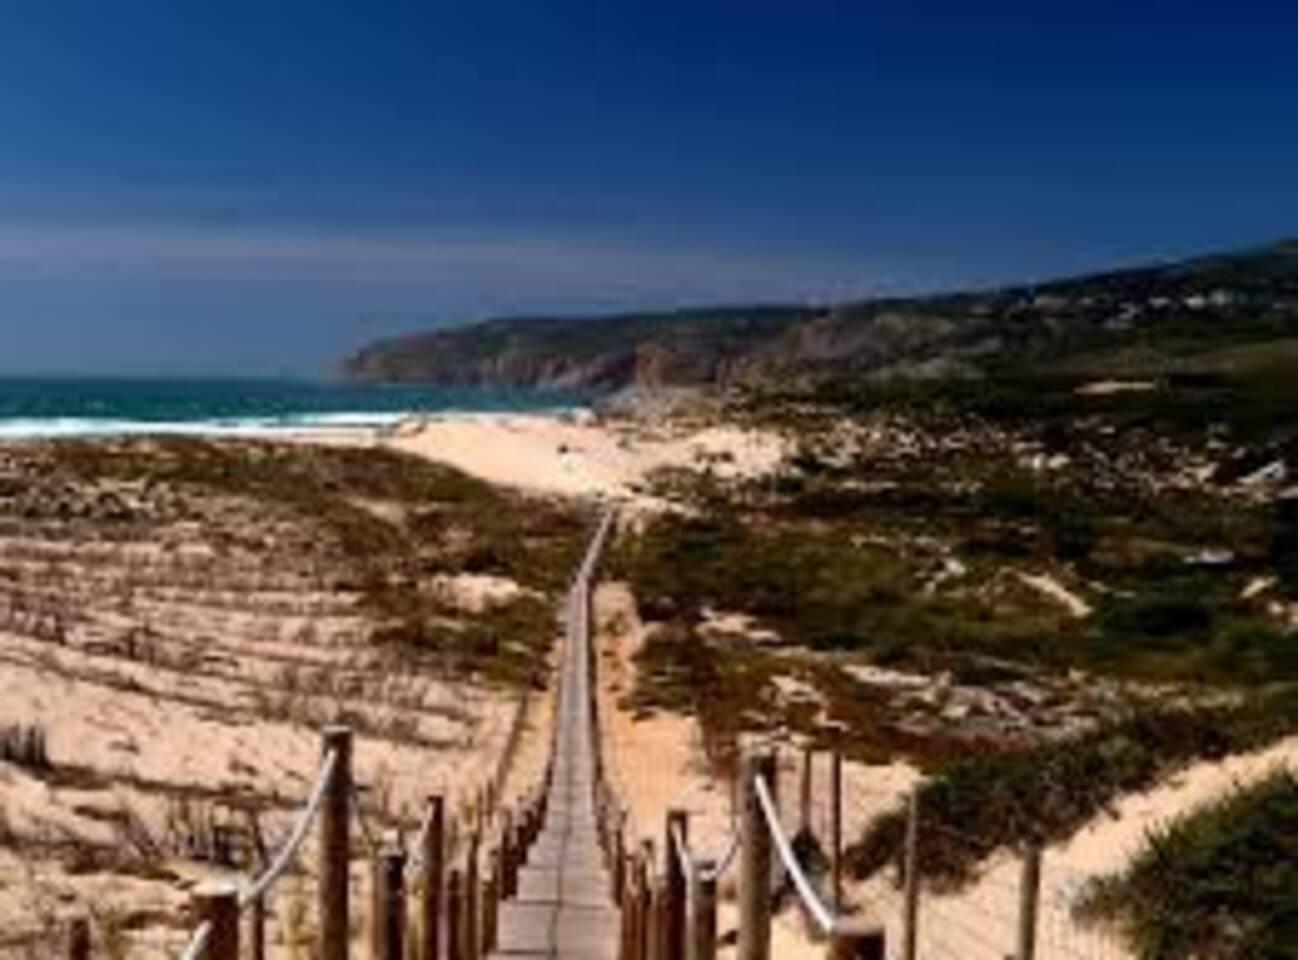 Guincho beach with cycle lane  7 km